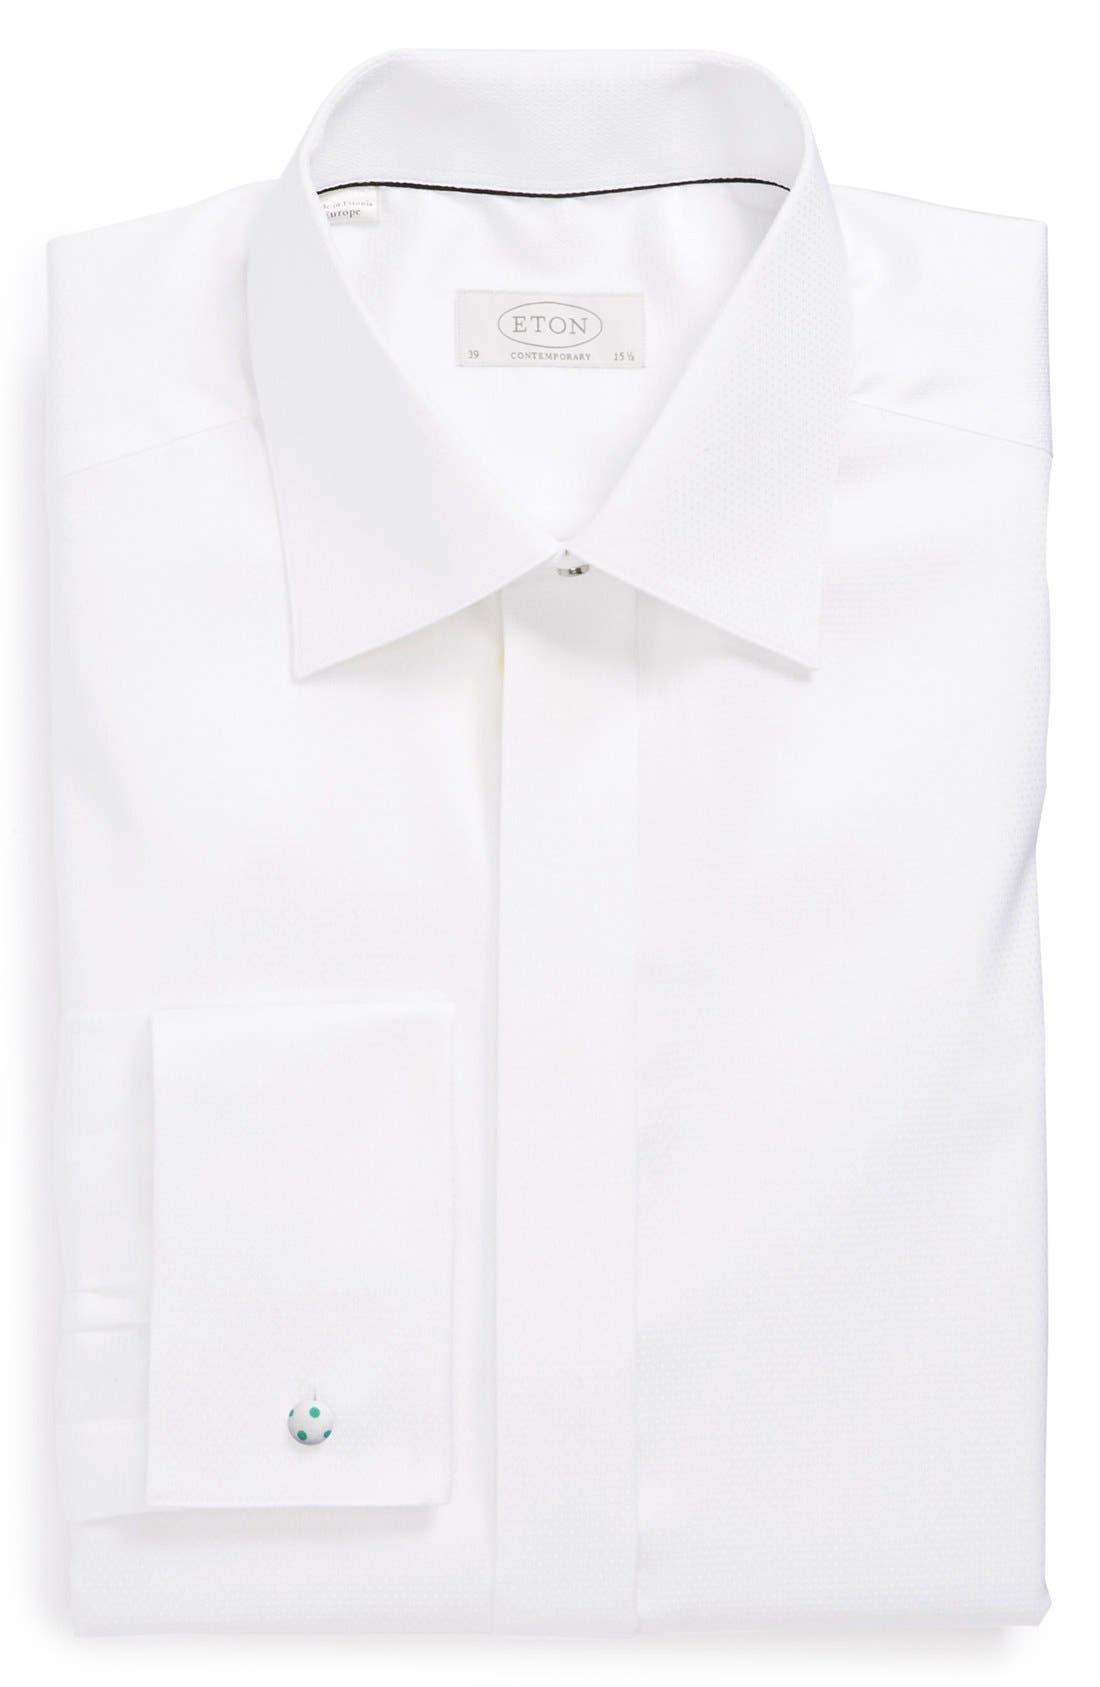 ETON Contemporary Fit Diamond Weave Tuxedo Shirt, Main, color, WHITE